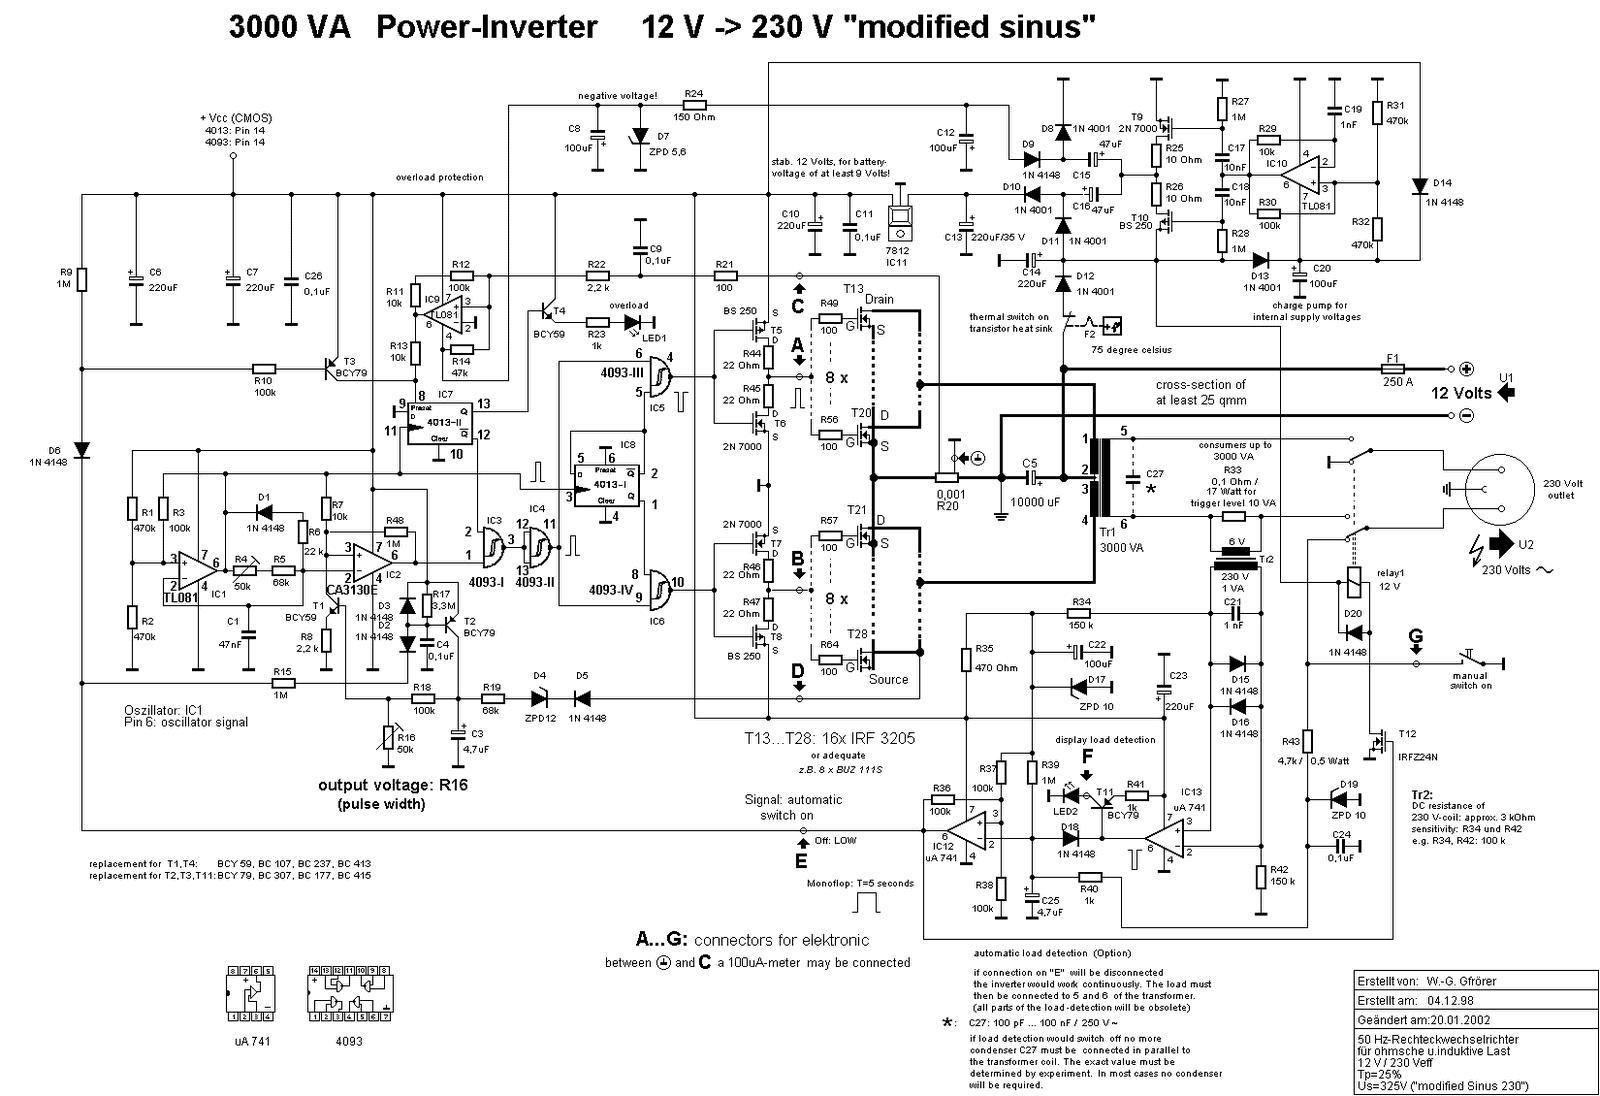 apc wiring diagrams wiring diagram APC UPS apc wiring diagrams